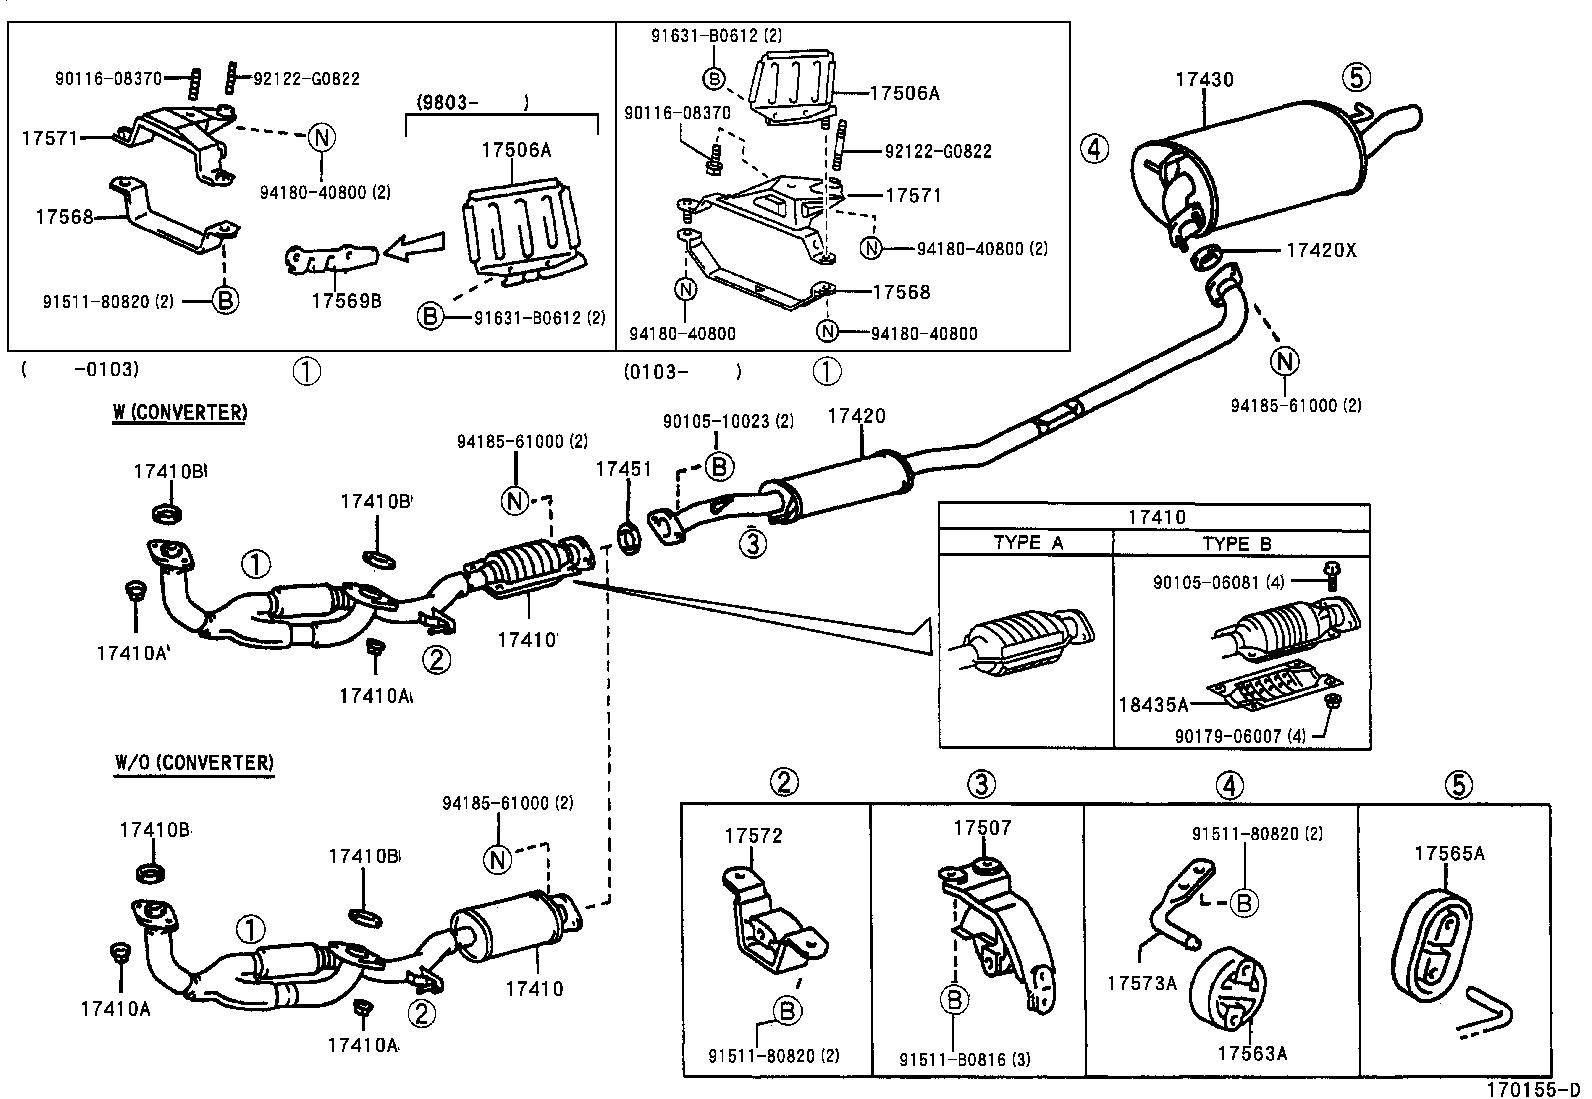 2003 alero radio wiring diagram with Toyota Engine System Diagram on 2000 Buick Century Fuel Line Diagram additionally P 0996b43f8037651d likewise 03 Alero Fuse Box Diagram moreover 2004 Honda Accord Suspension Diagram in addition 1999 Oldsmobile Intrigue Wiring Diagram.